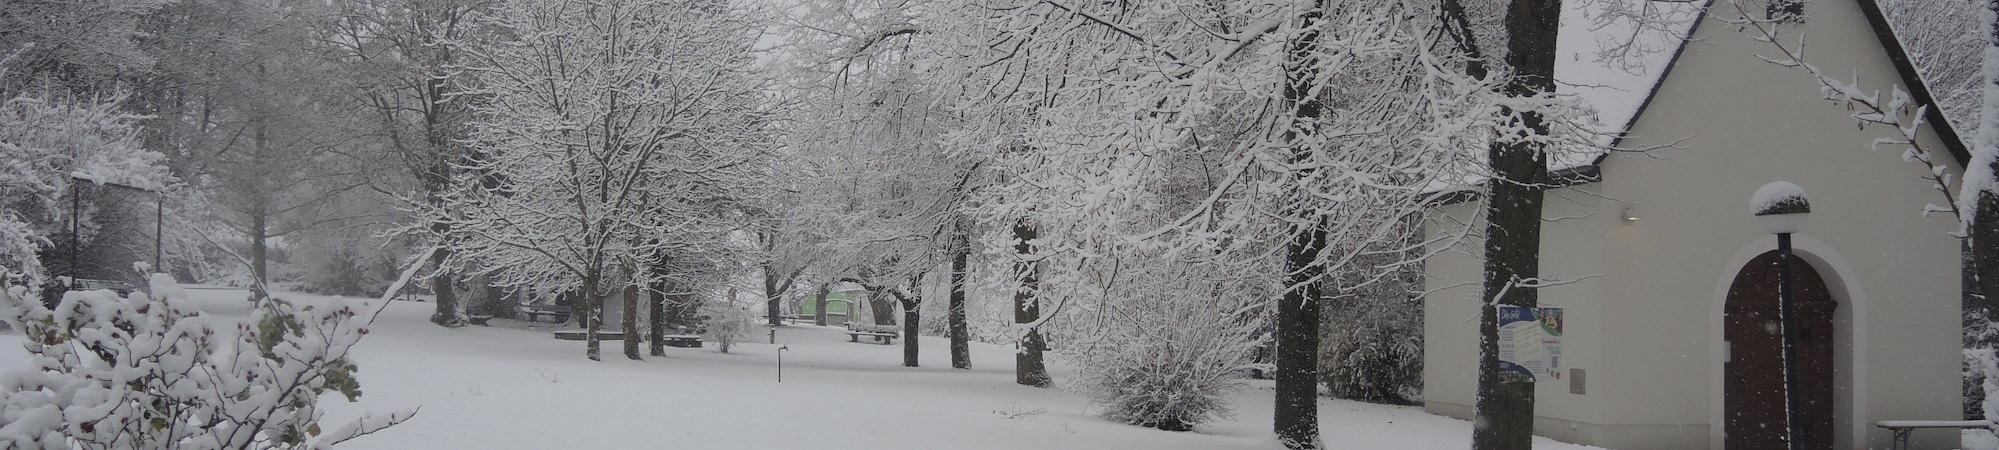 Mahoe_Winter_2020